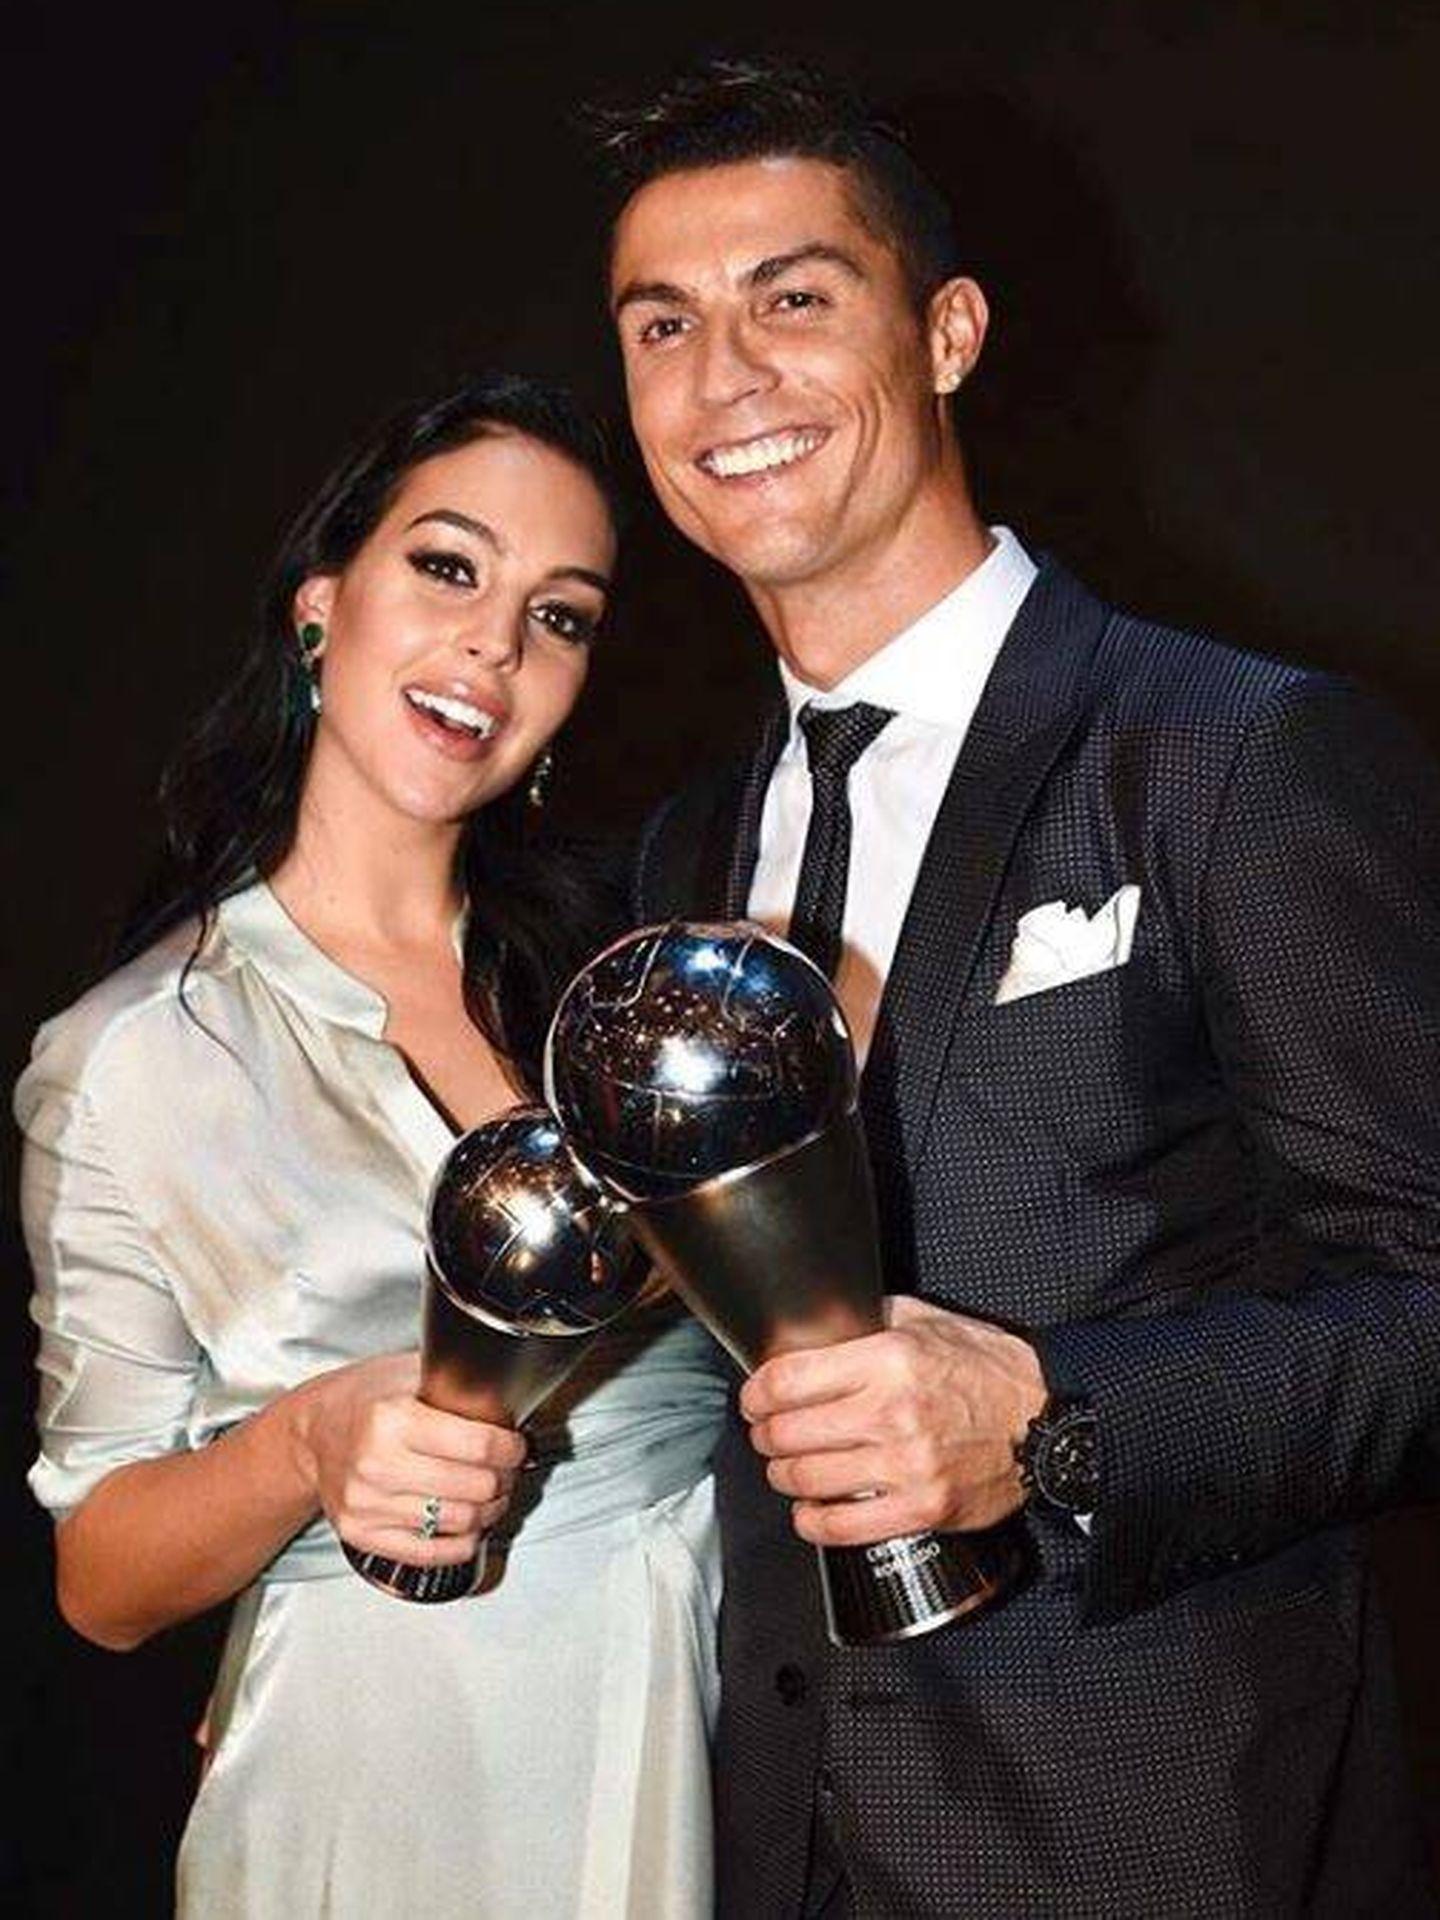 Georgina Rodríguez y Cristiano Ronaldo. (Instagram)